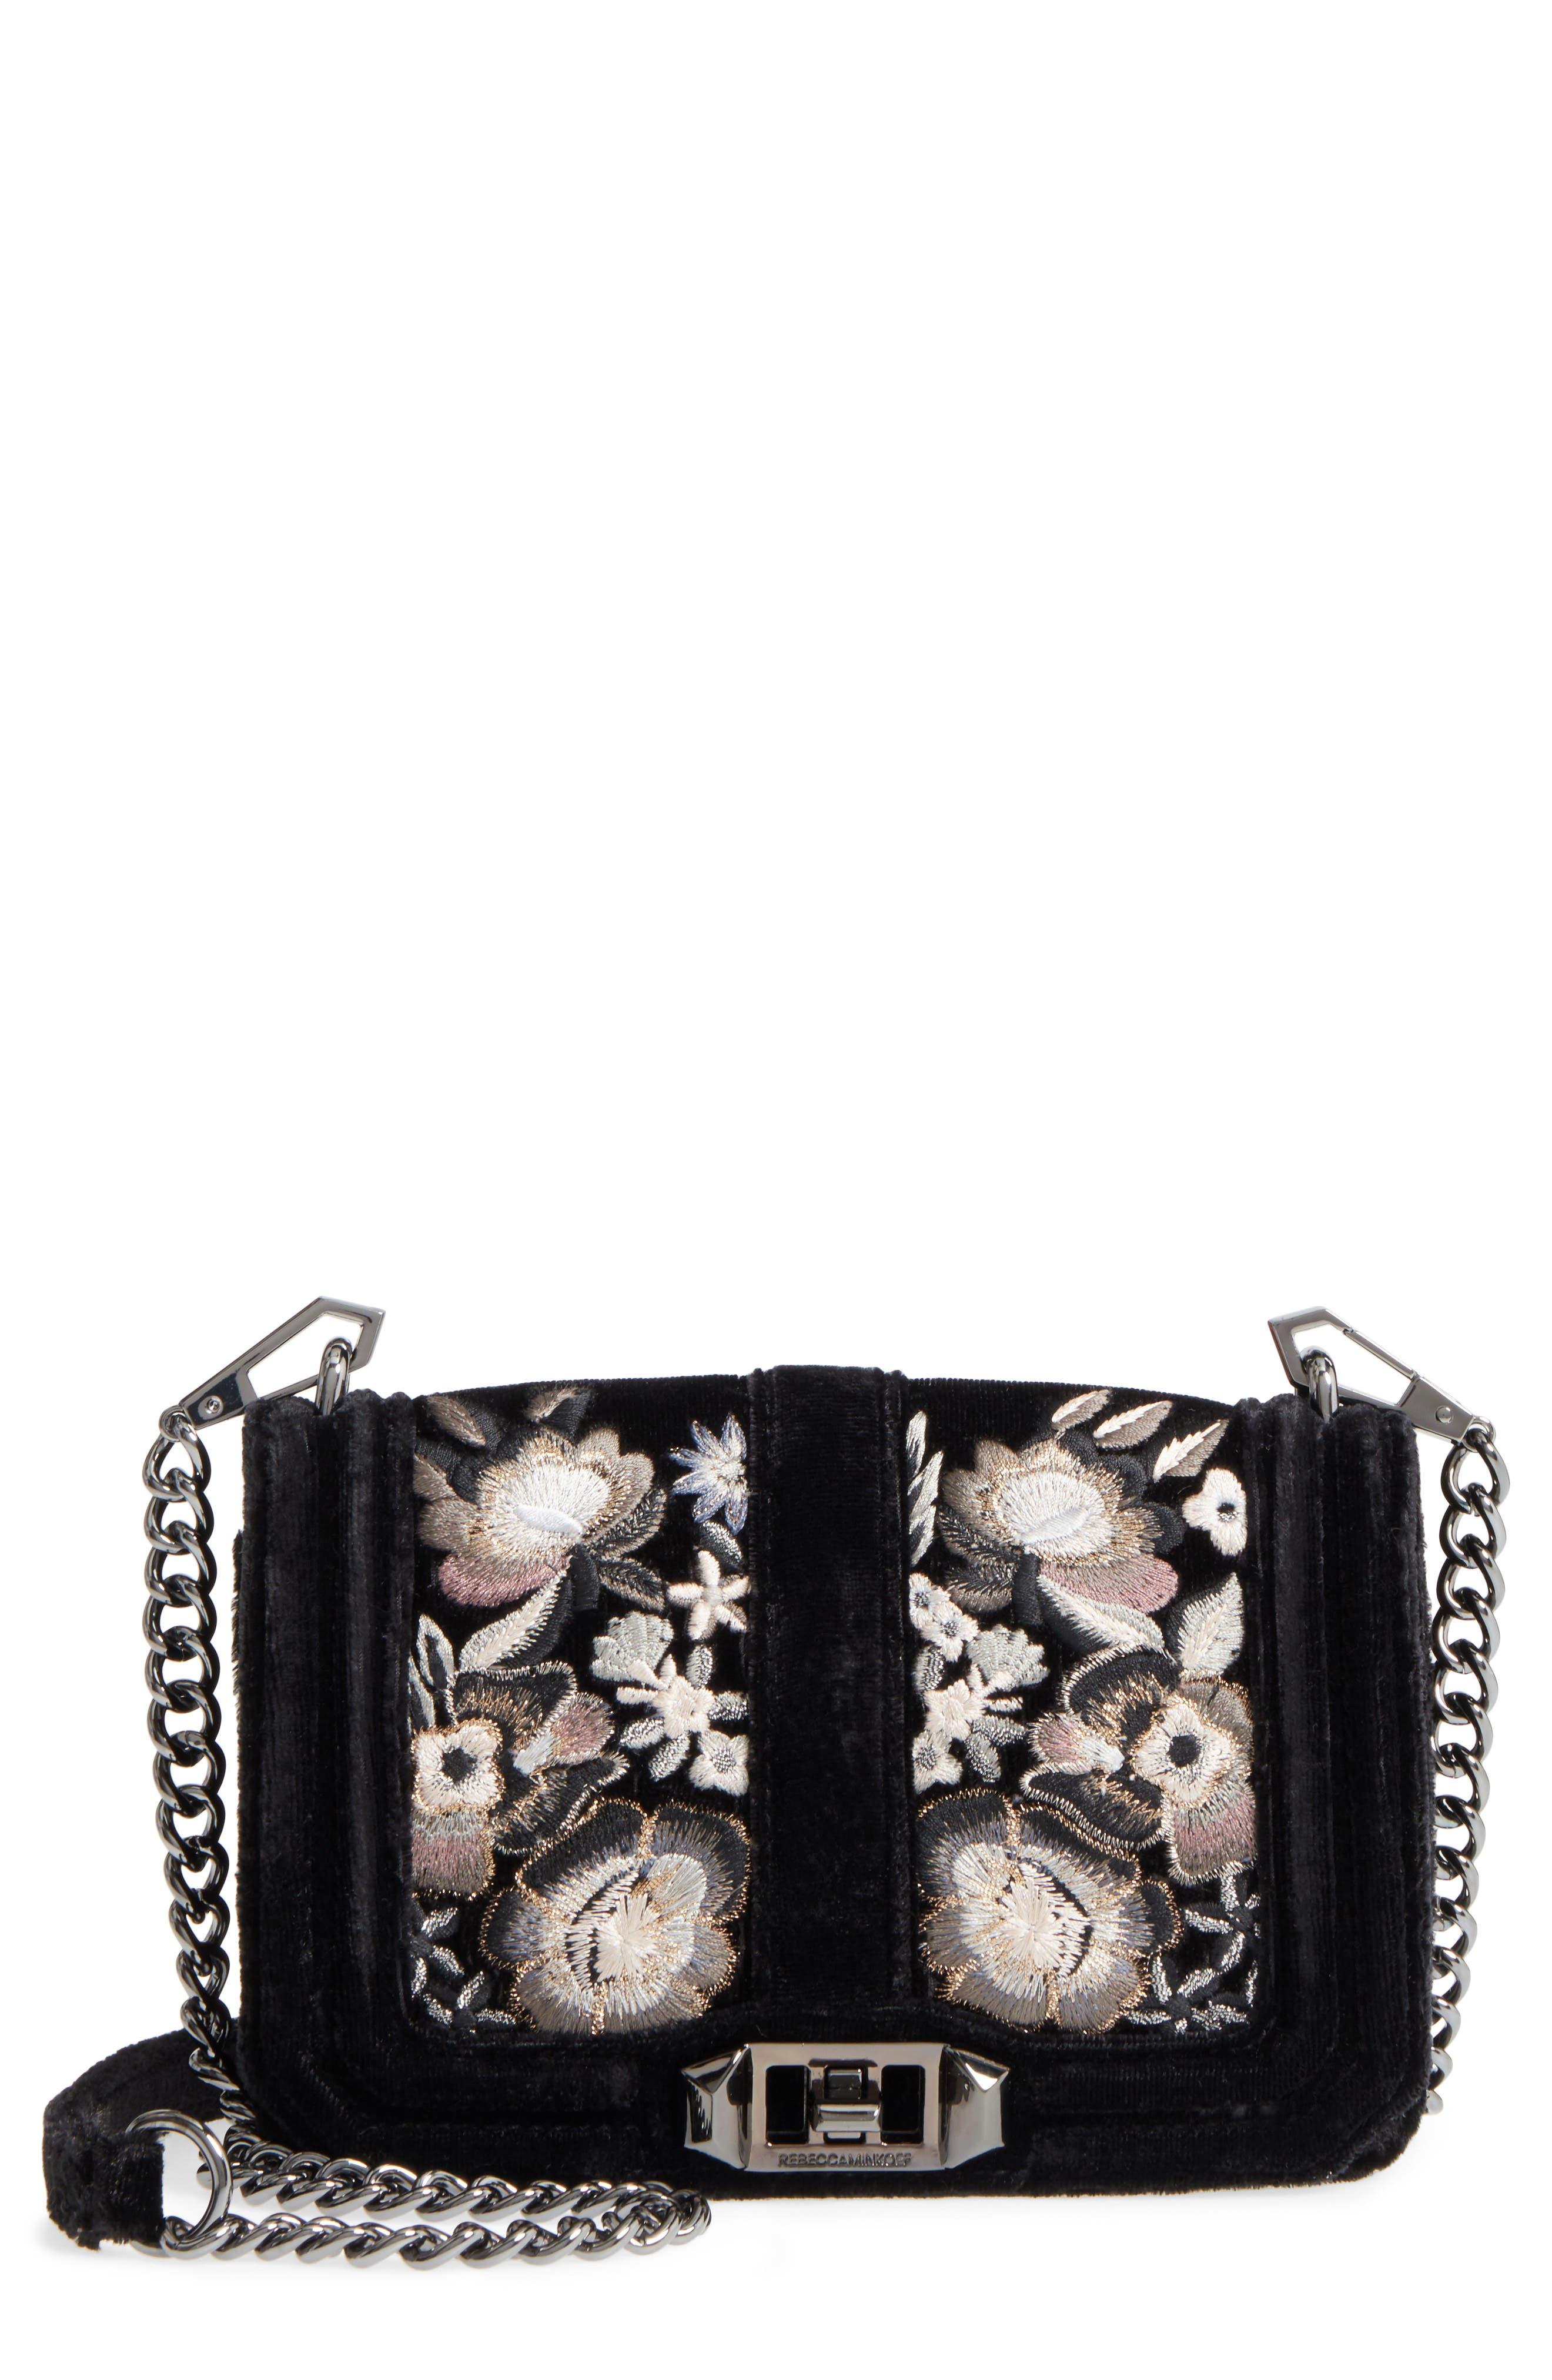 Small Love Floral Embroidery Velvet Crossbody Bag,                             Main thumbnail 1, color,                             001